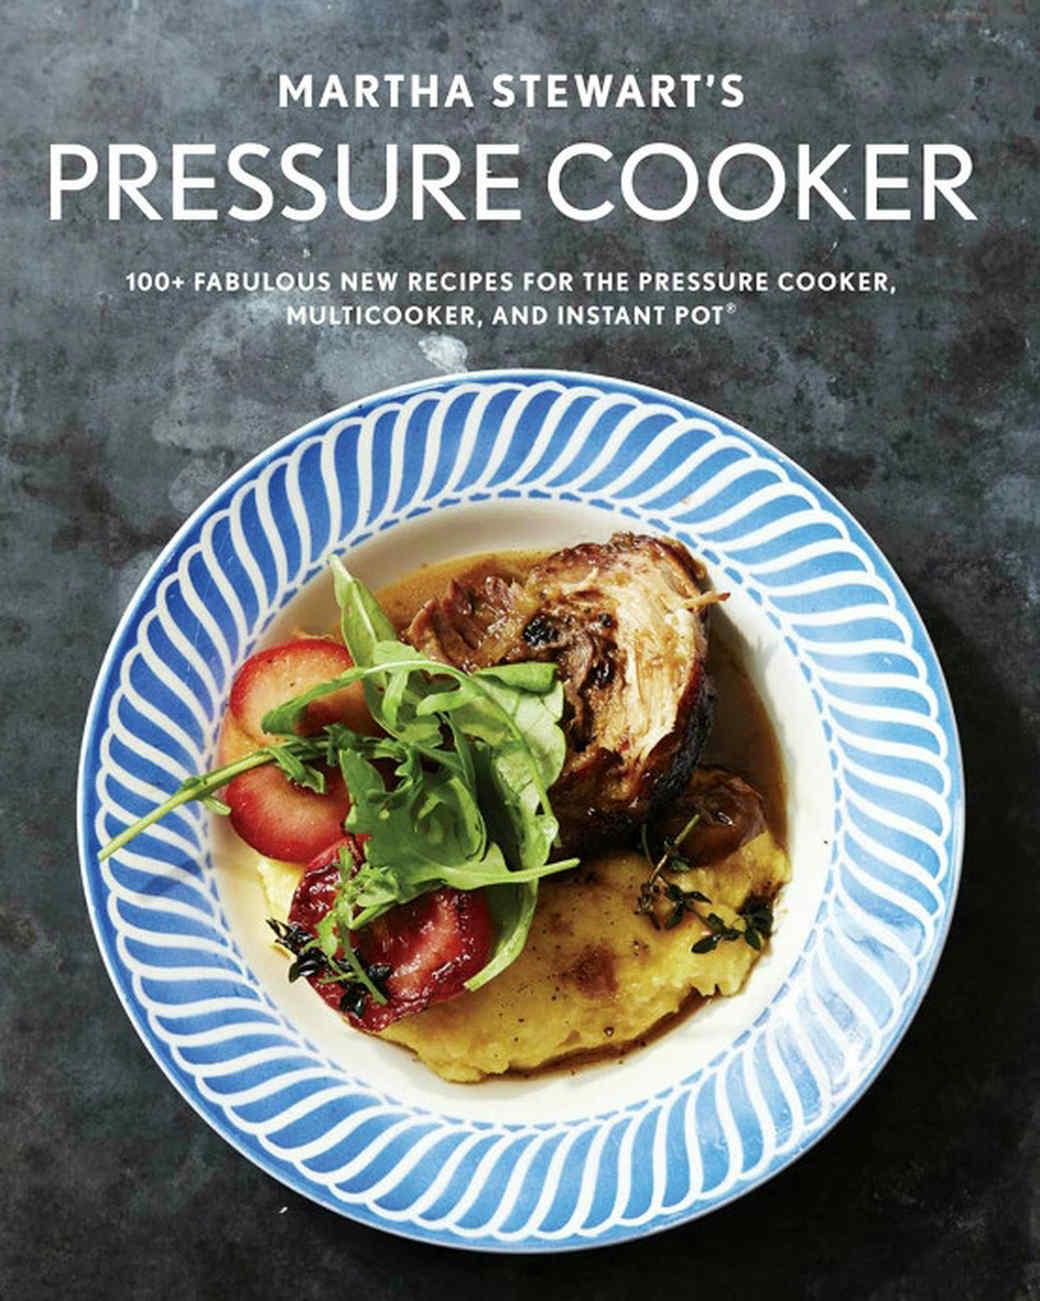 martha stewart's pressure cooker cookbook cover